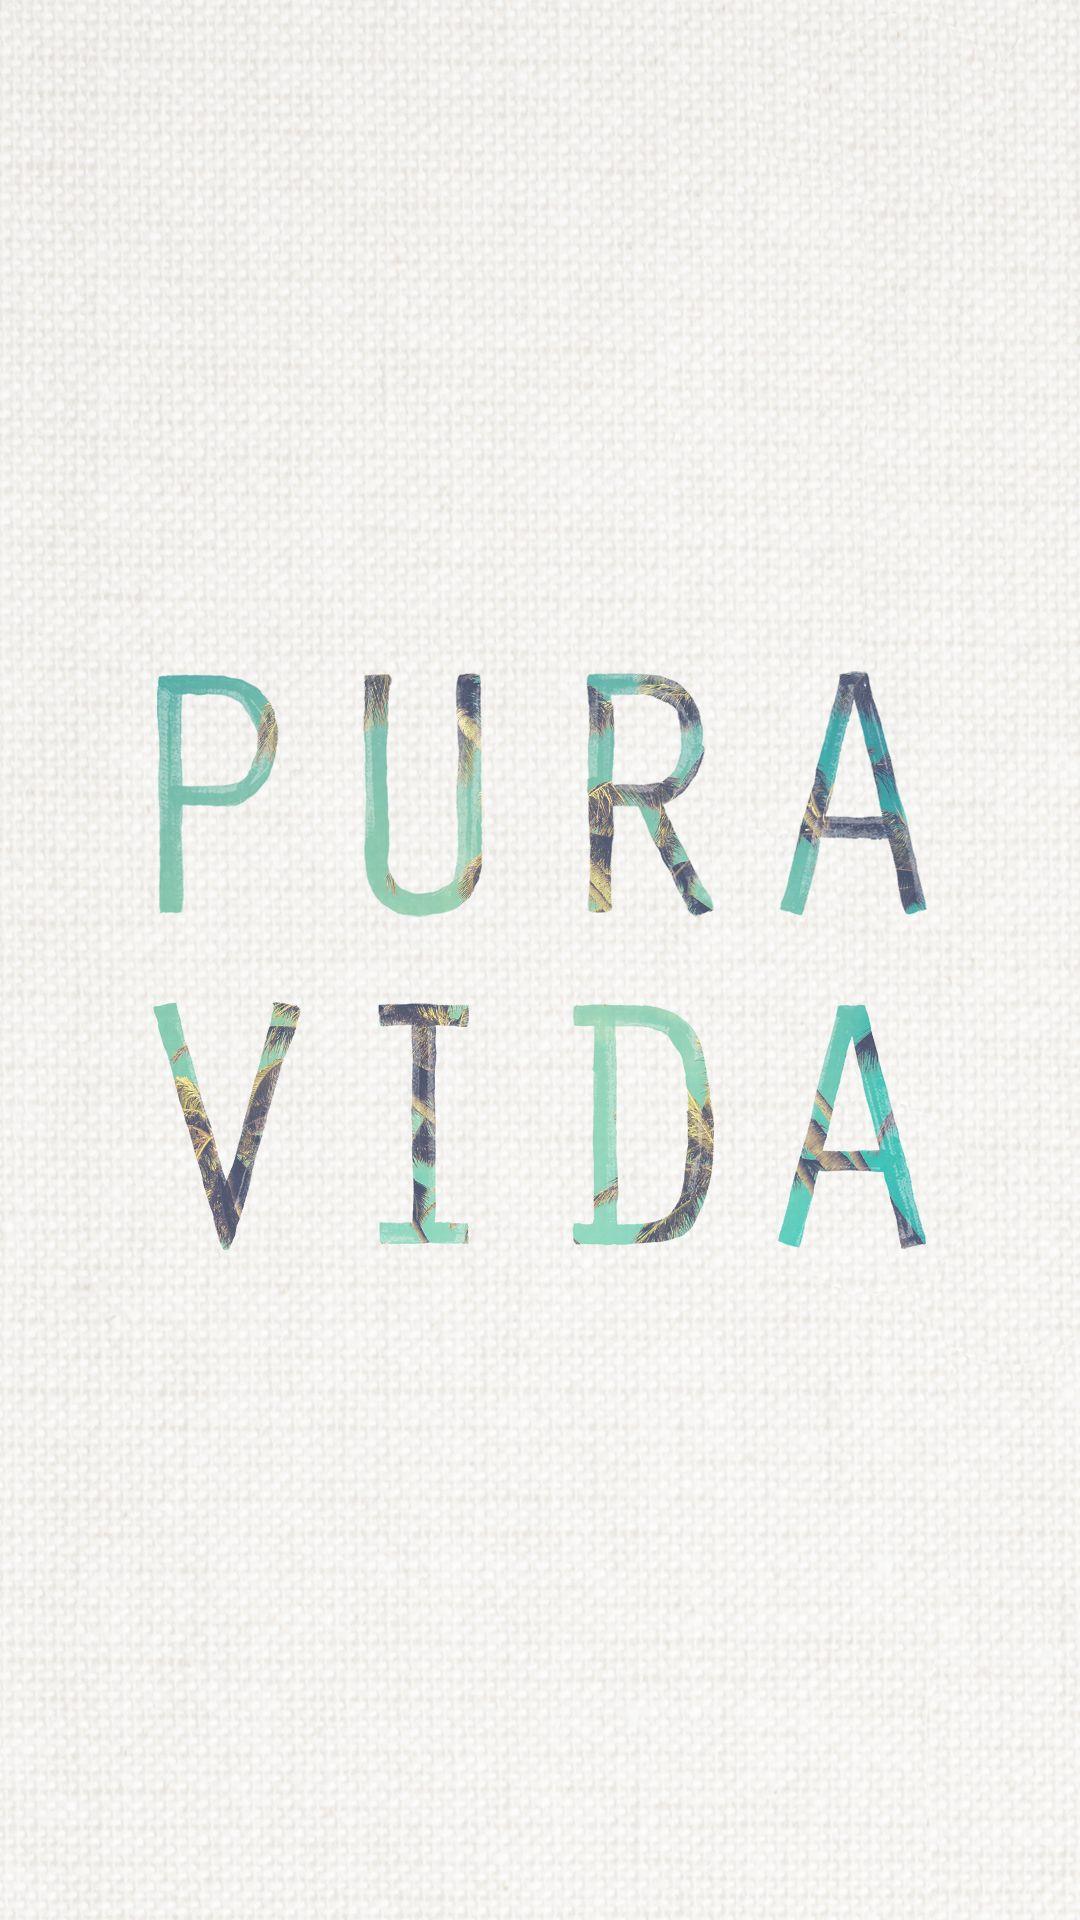 pura vida wallpaper  Dress Your Tech | The Pura Vida Bracelets BlogThe Pura Vida ...